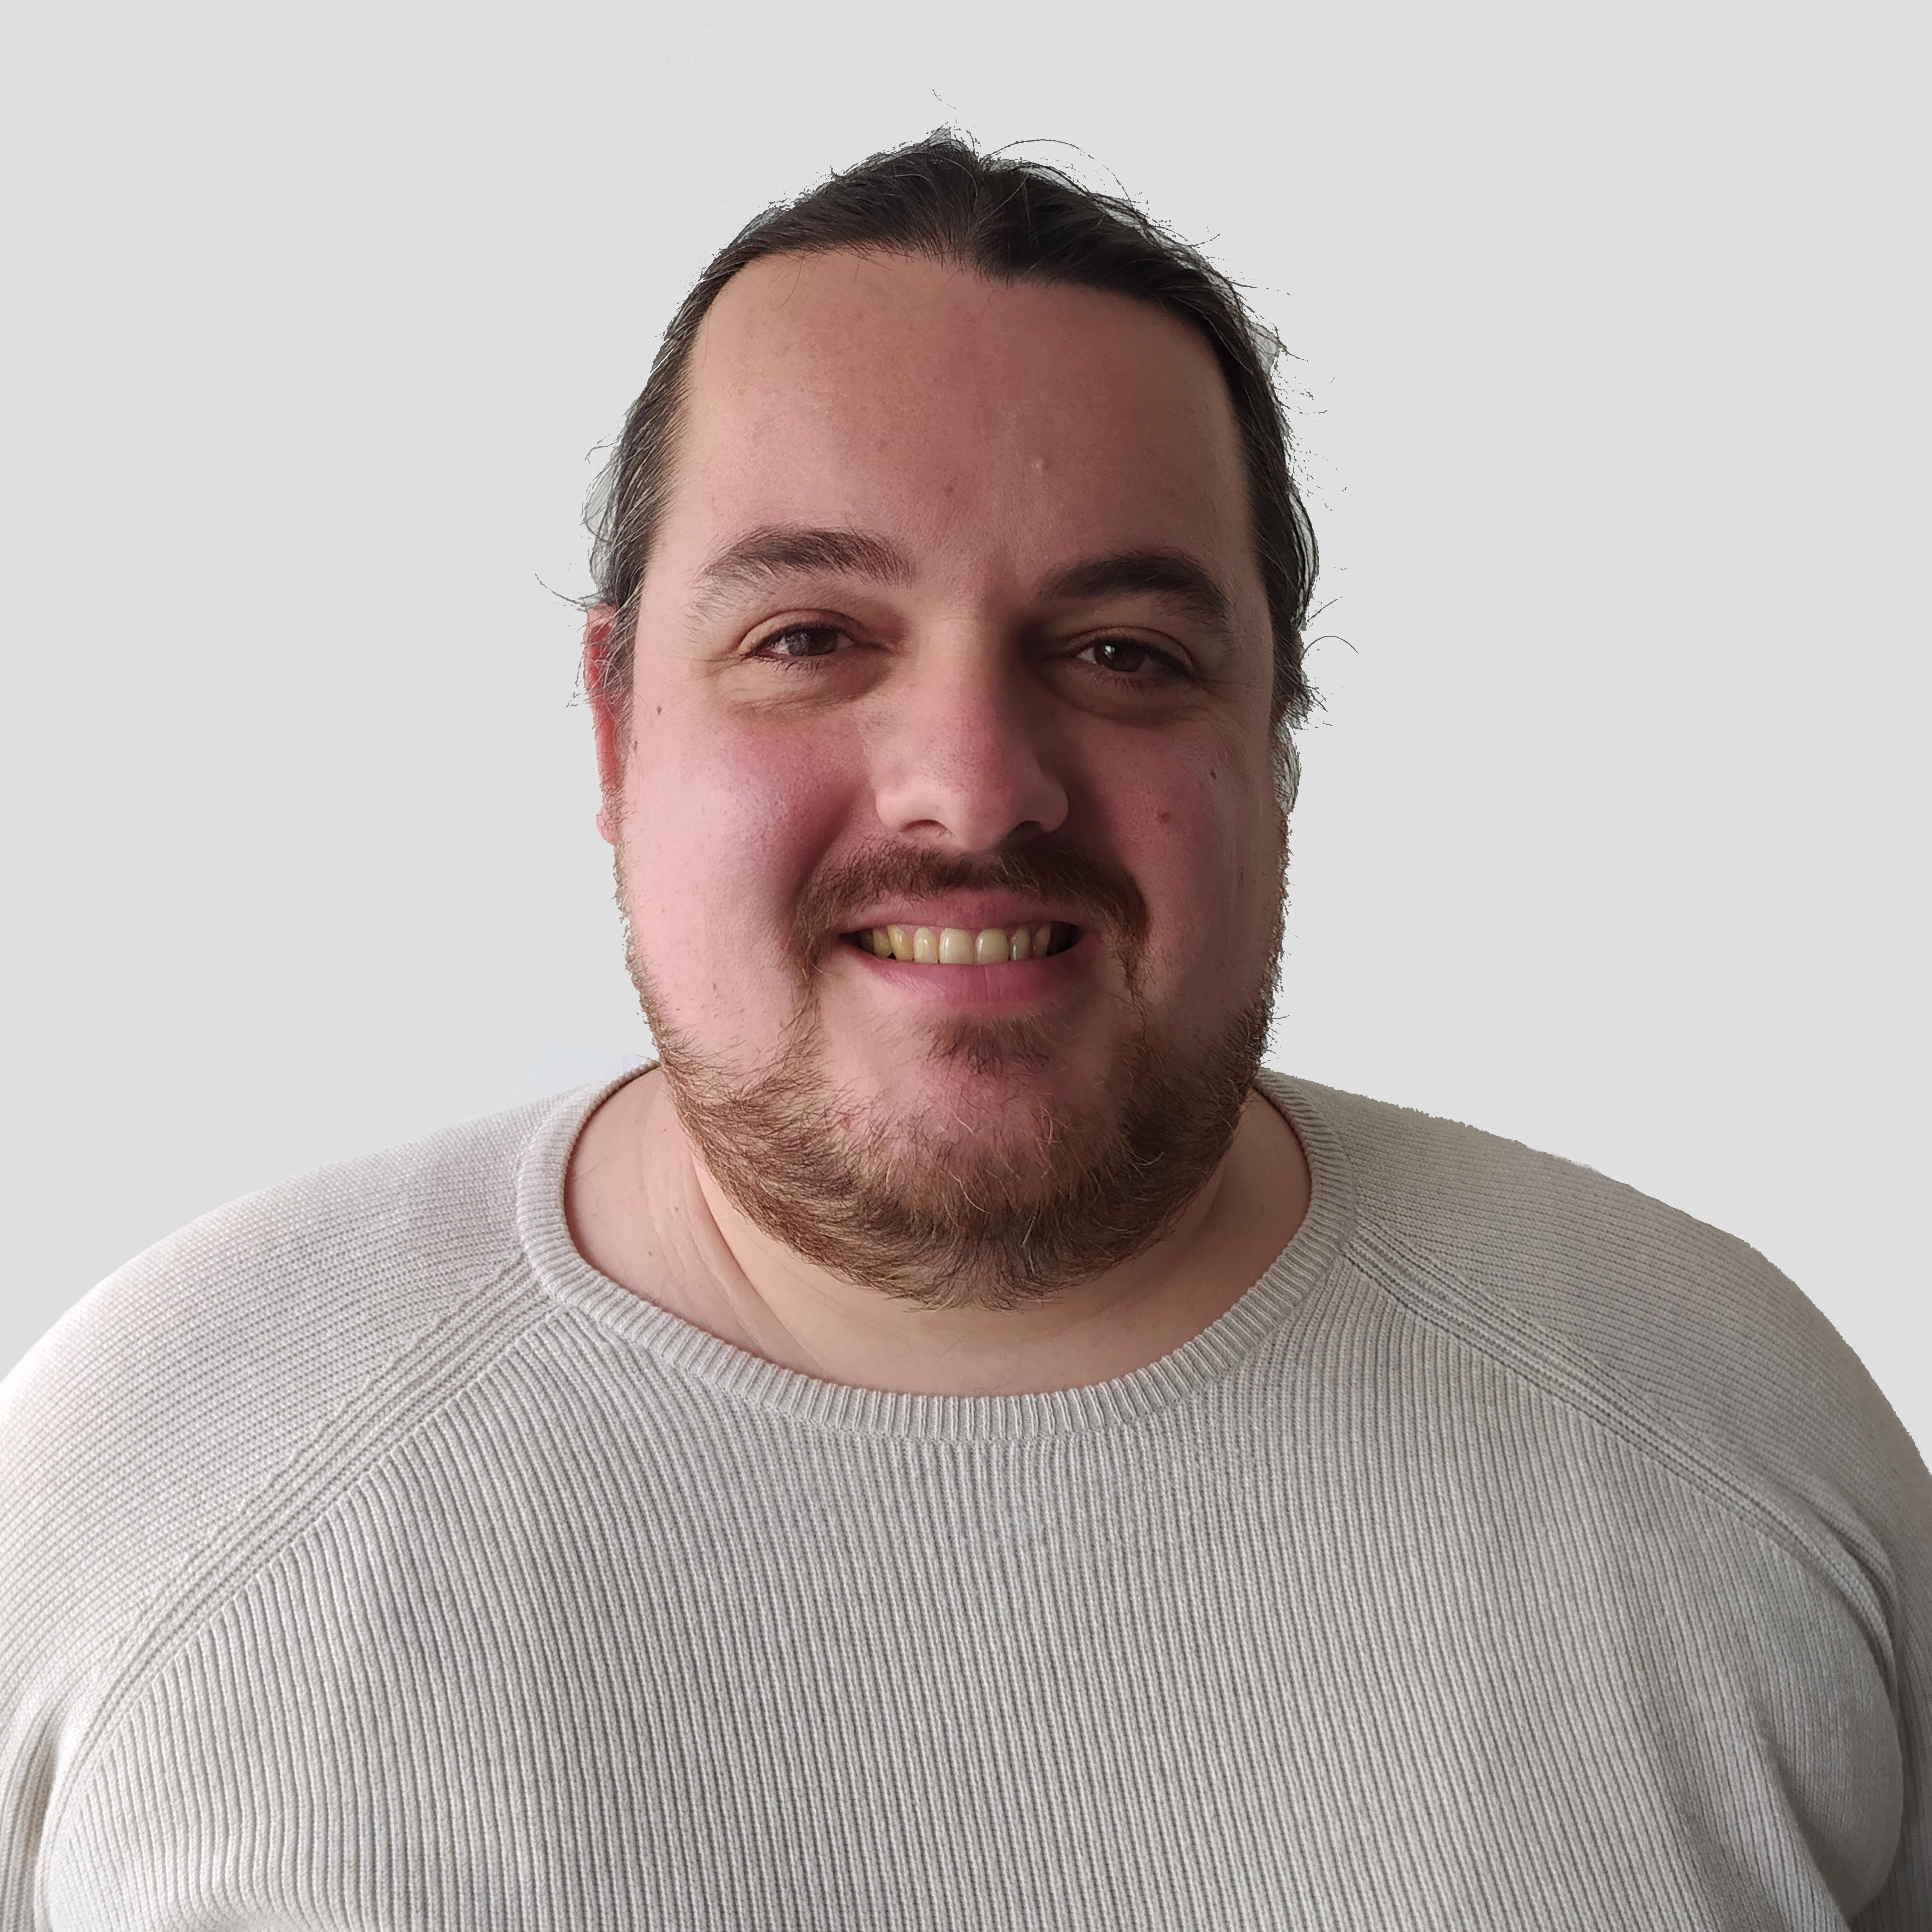 Mirko Vujisić